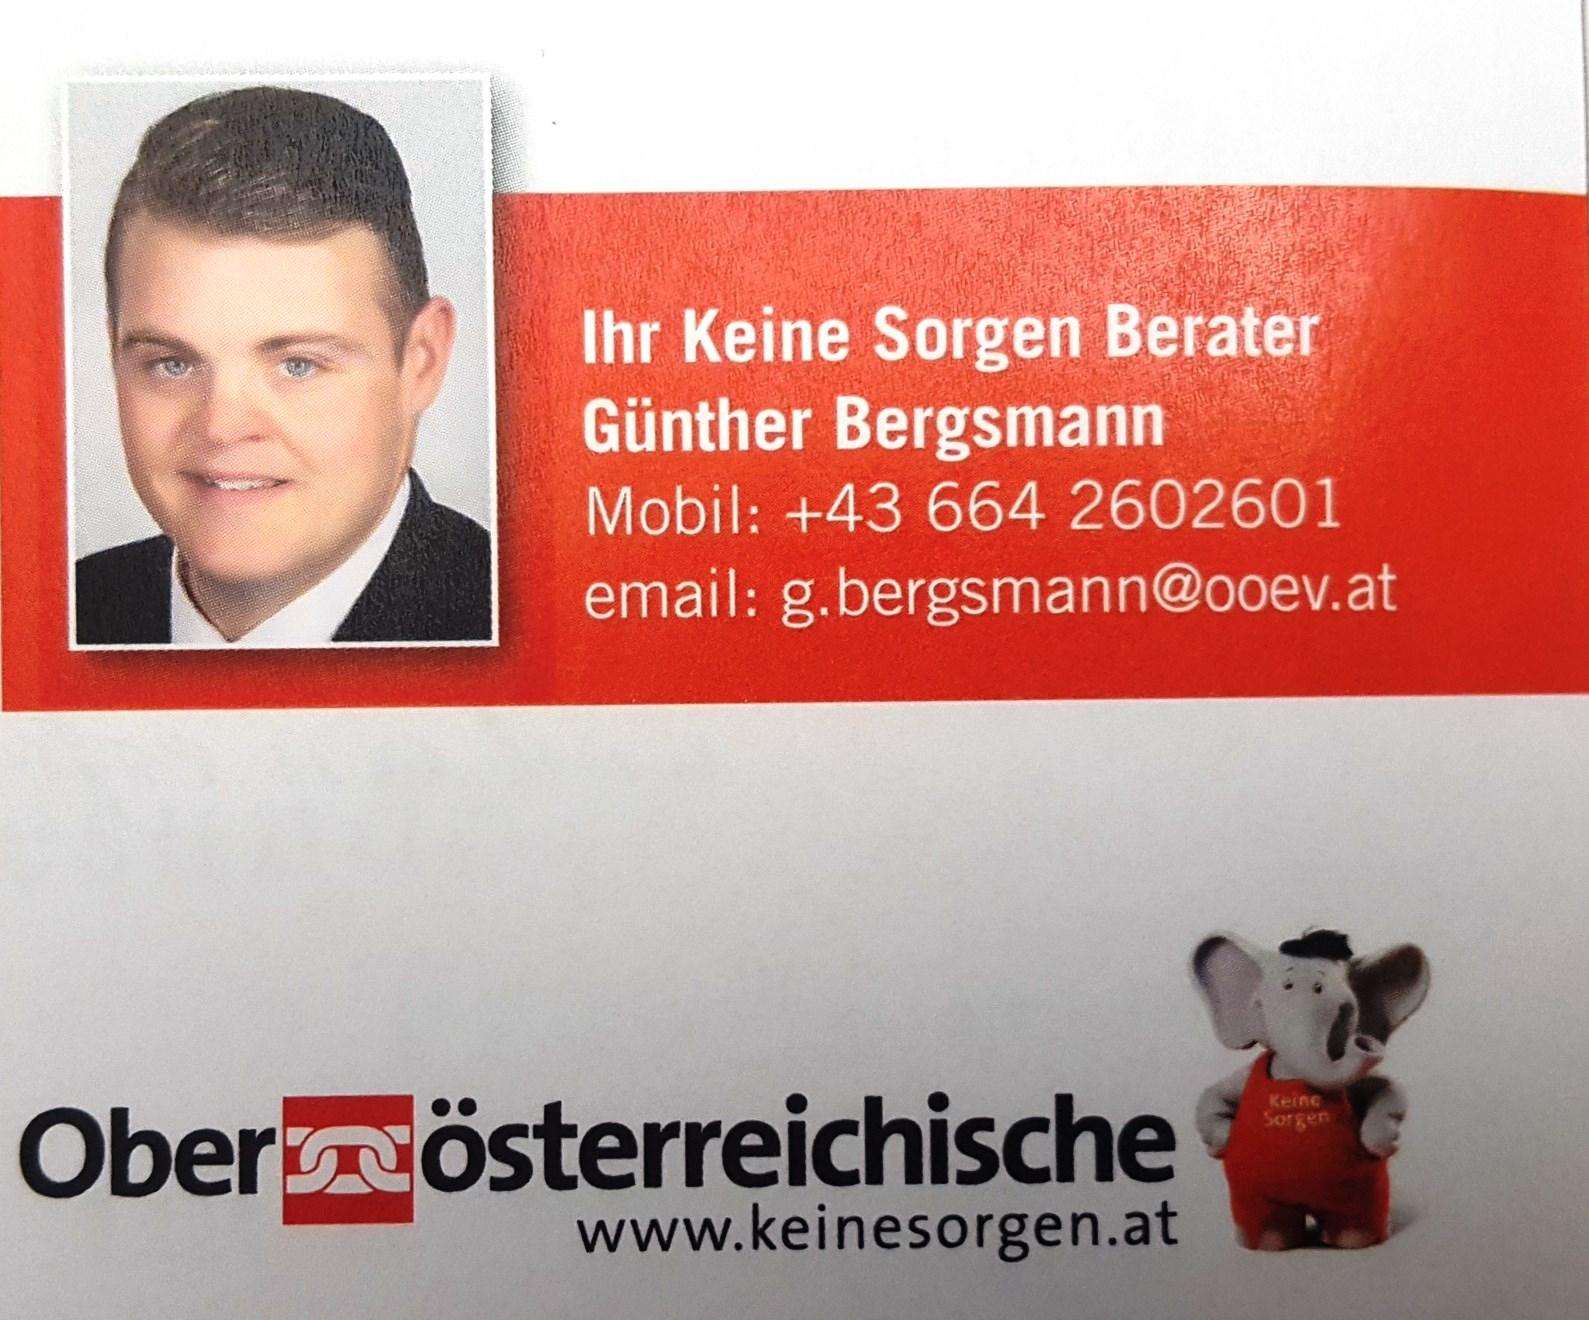 Günther Bergsmann